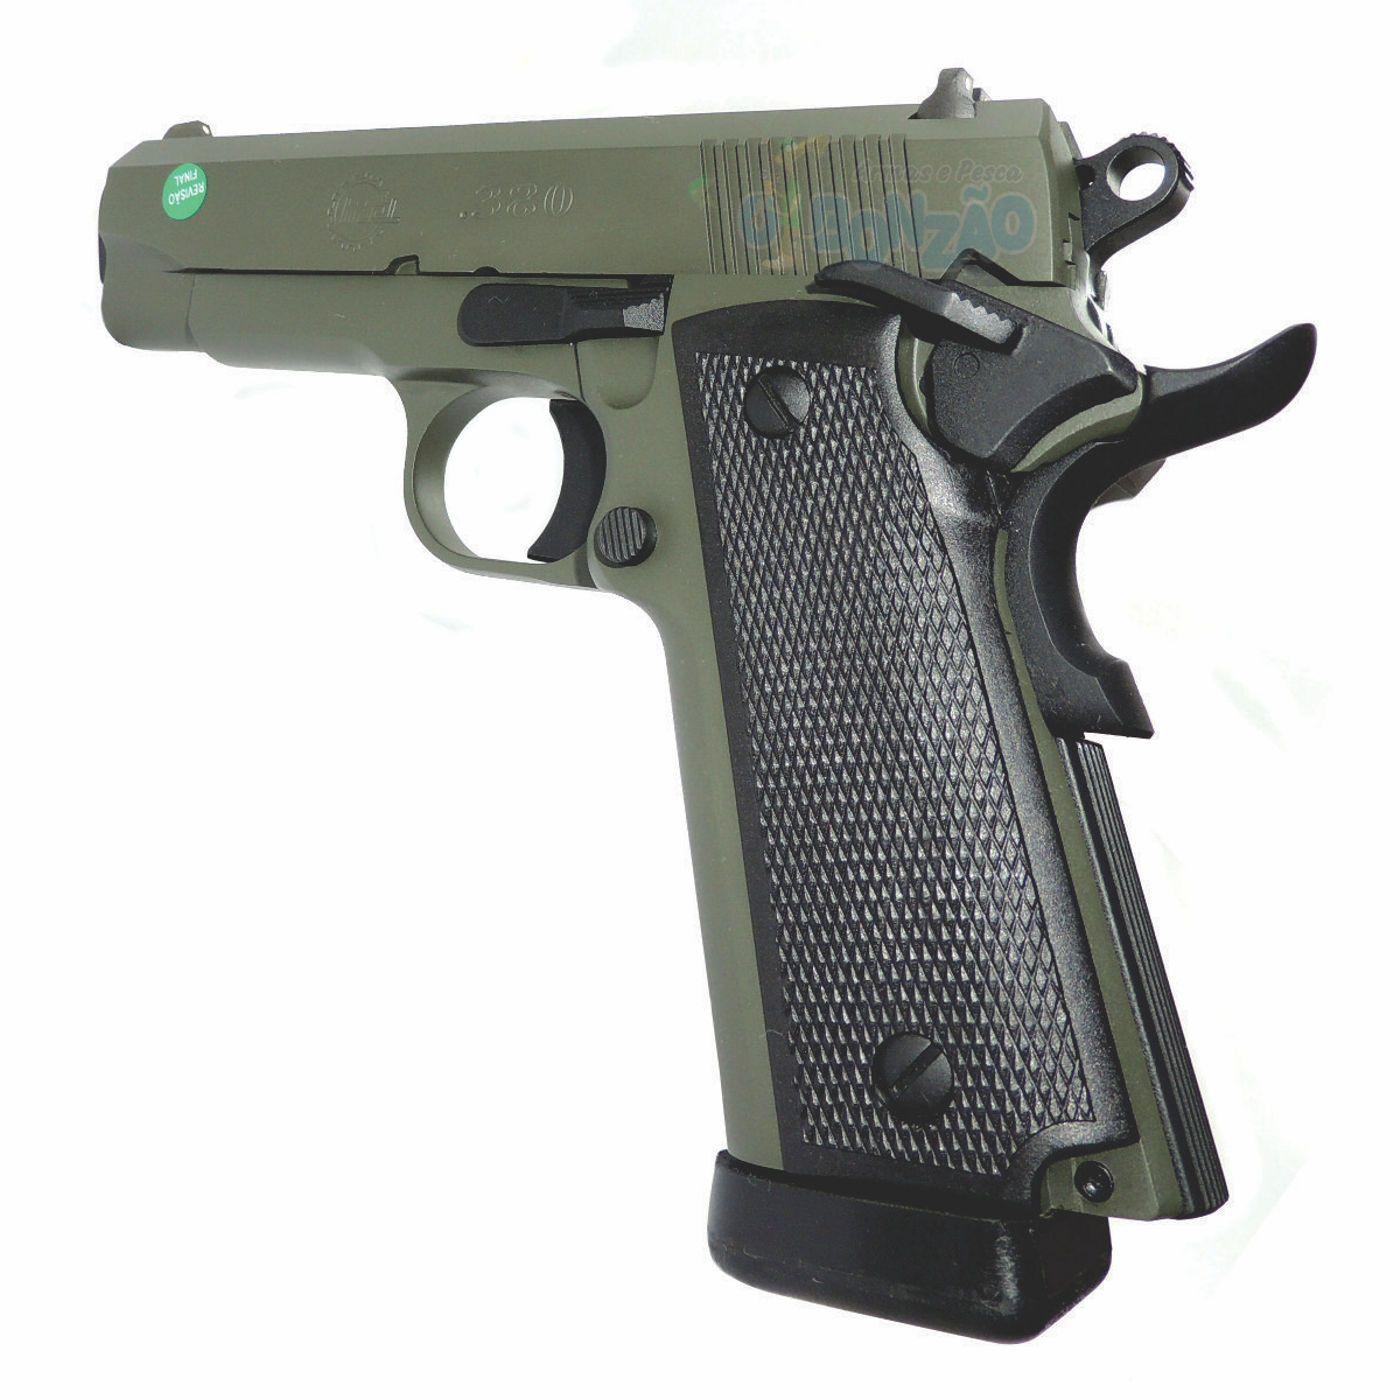 Pistola Imbel MD1 GC Cal .380 ACP 19+1 Tiros Oxidada Verde